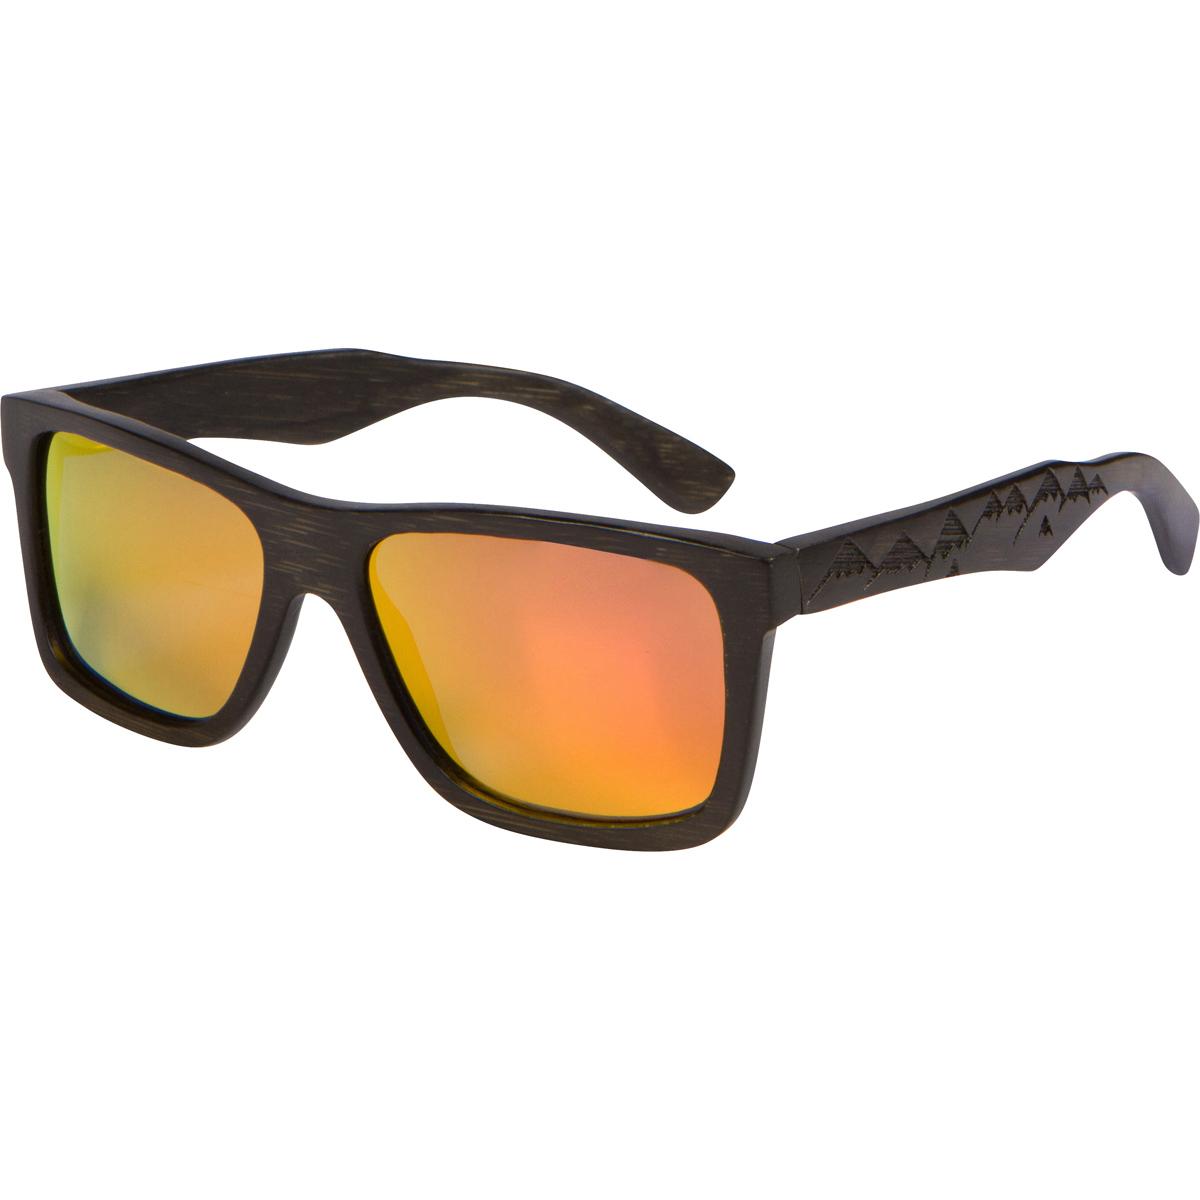 3870548049 Lightweight Bamboo Wood Sunglasses